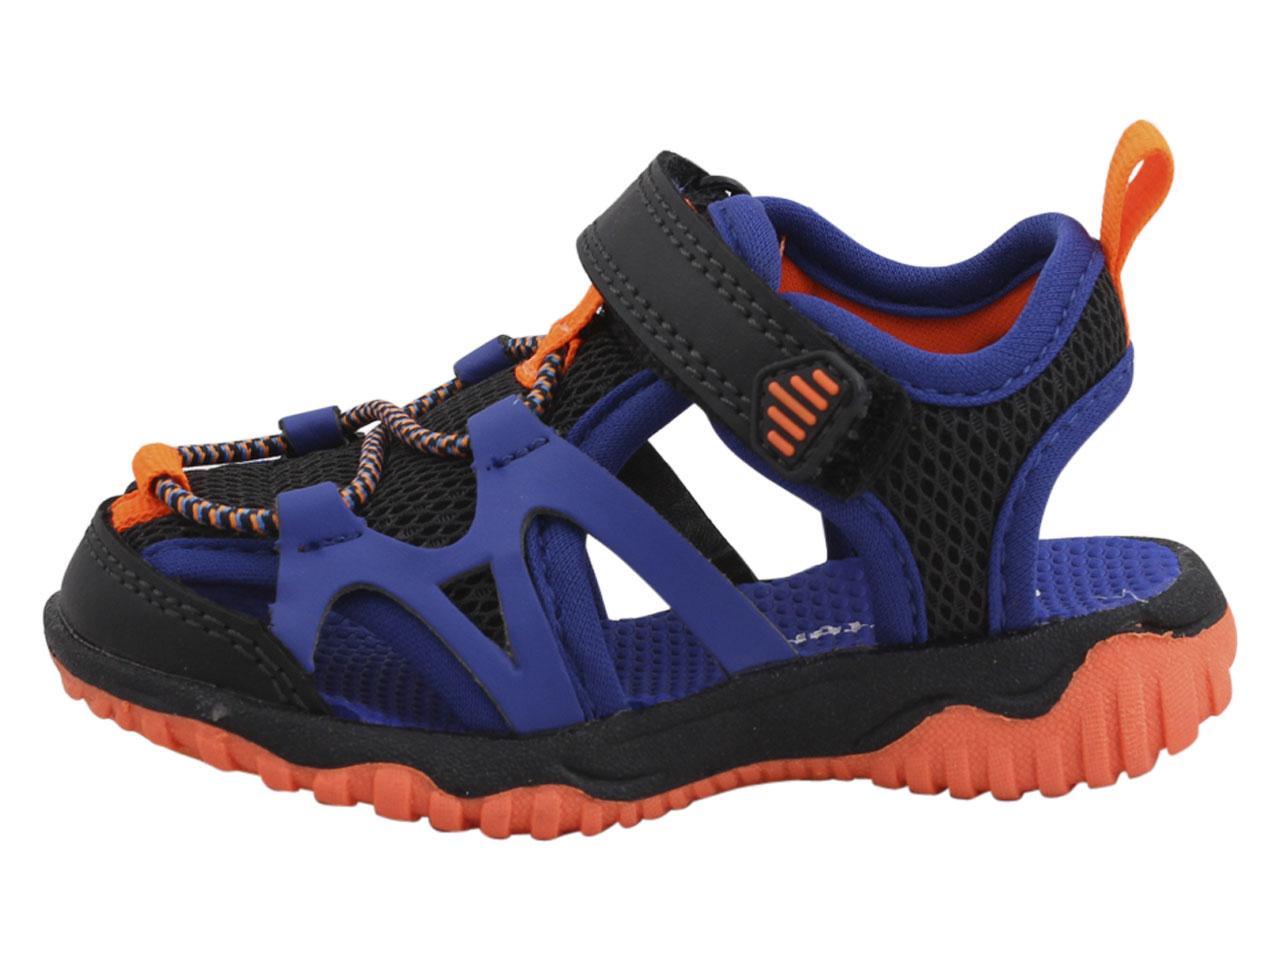 Carter-039-s-Toddler-Boy-039-s-Zyntec-B-Sandals-Shoes thumbnail 9